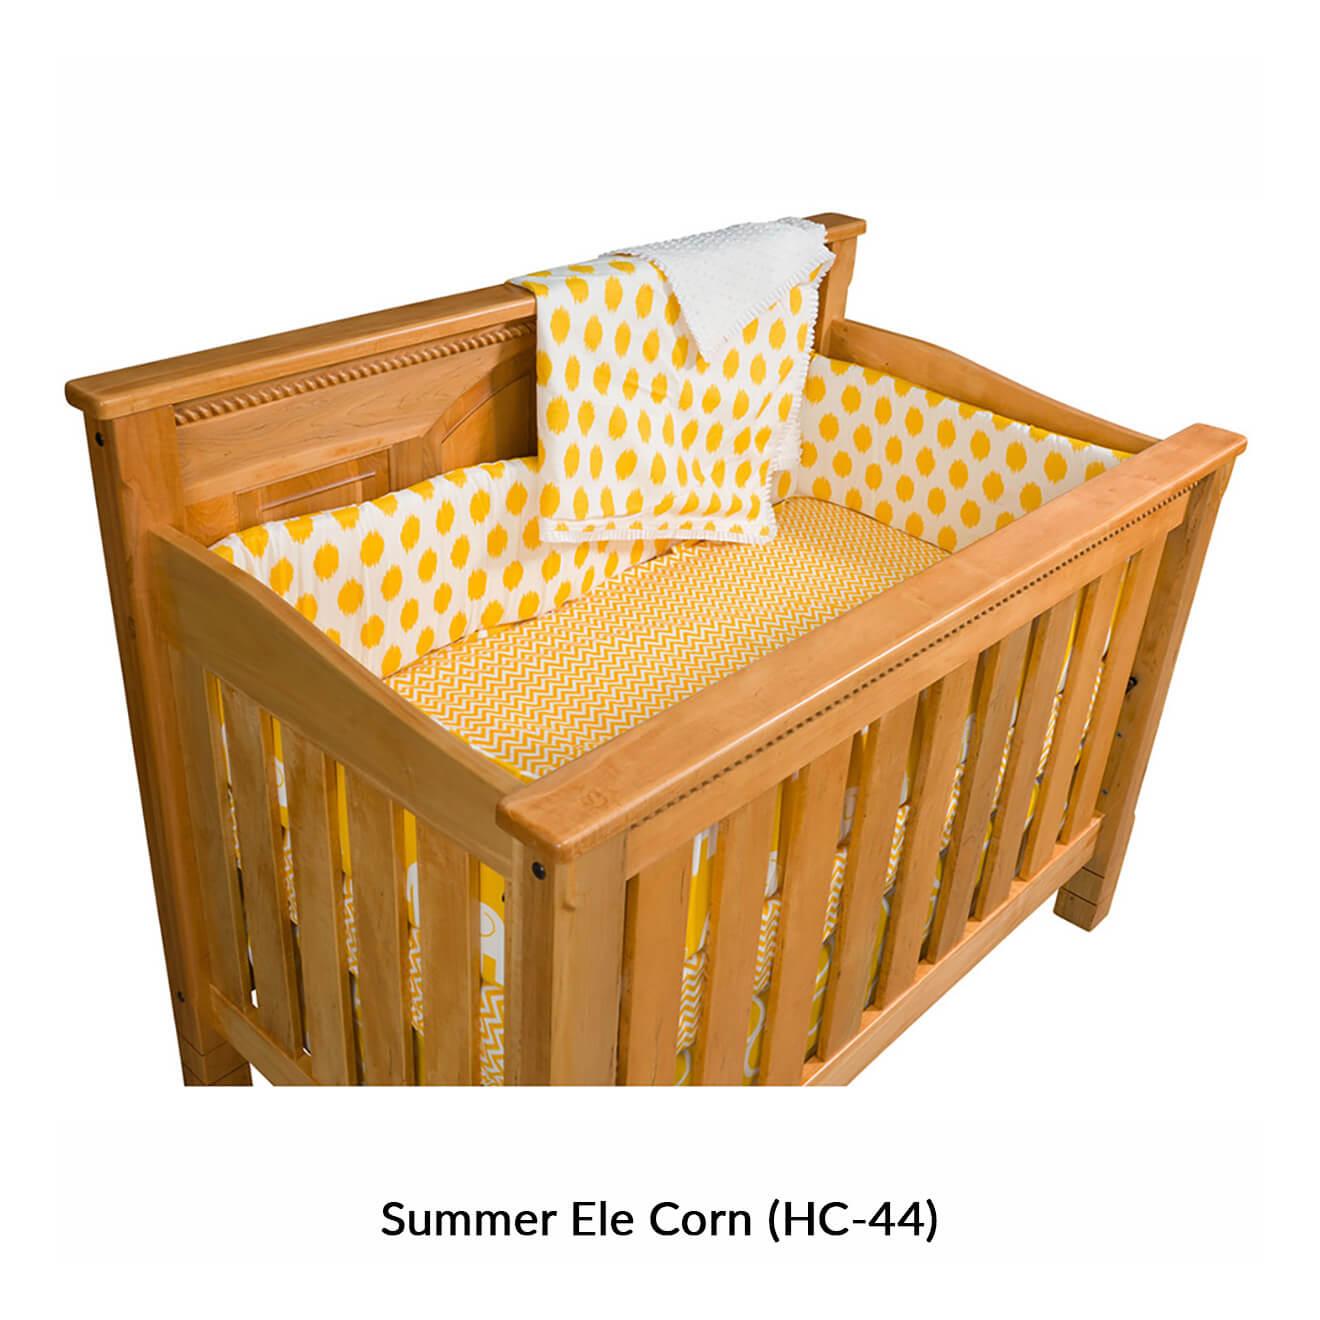 28.-summer-ele-corn-hc-44-.jpg